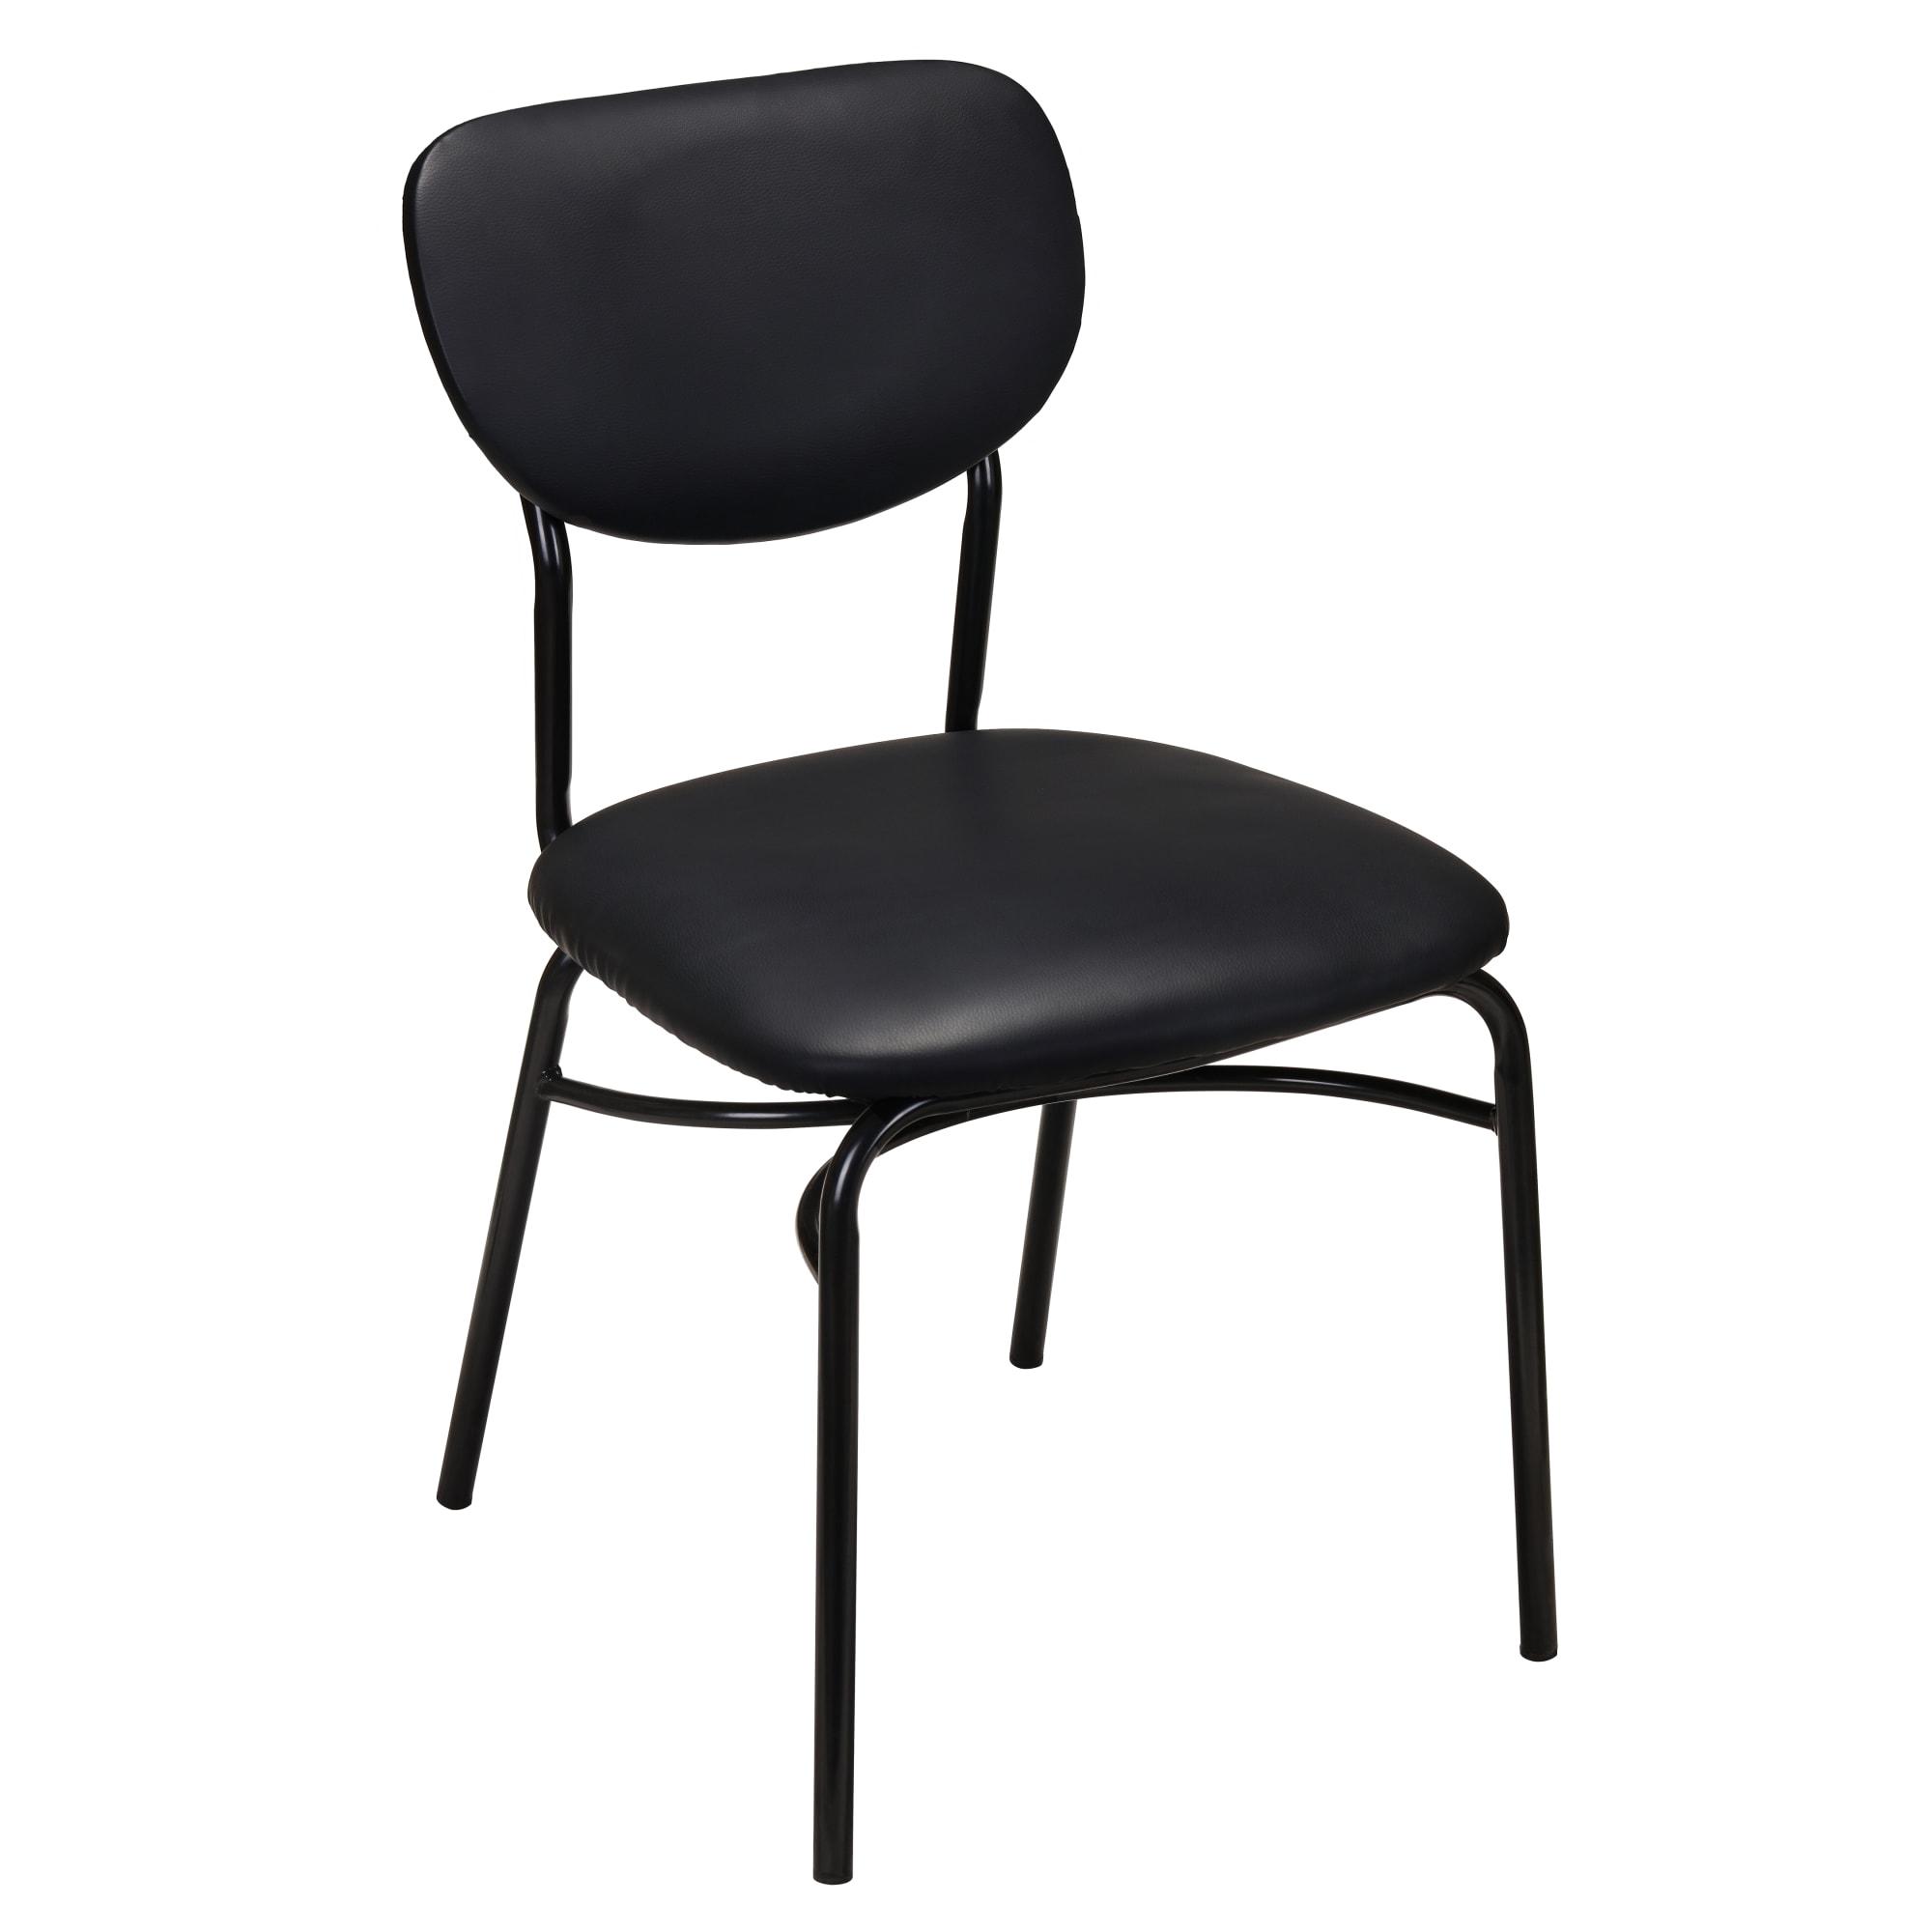 Xavi Padded Metal Chair with Xavi Padded Metal Chair